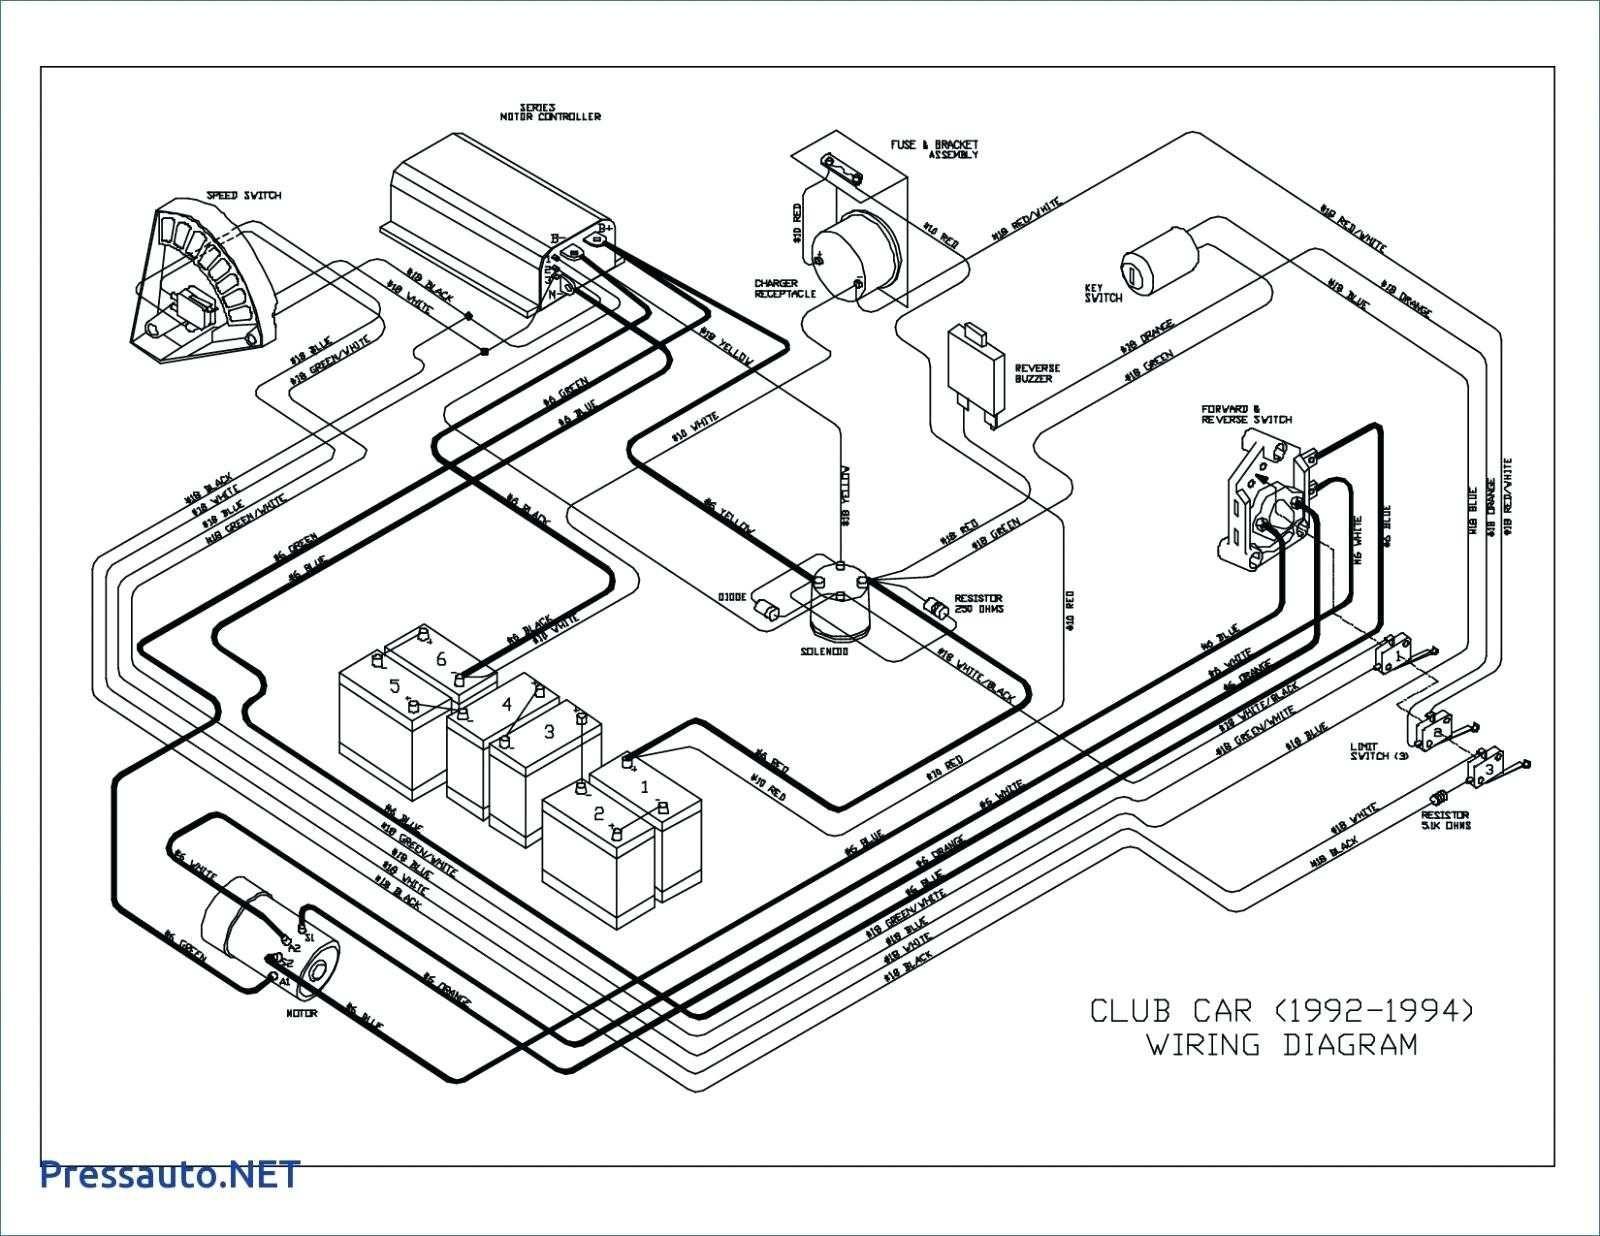 Club Car Golf Cart Wiring Diagram Lovely Yamaha Golf Cart Troubleshooting Gas Gallery Free